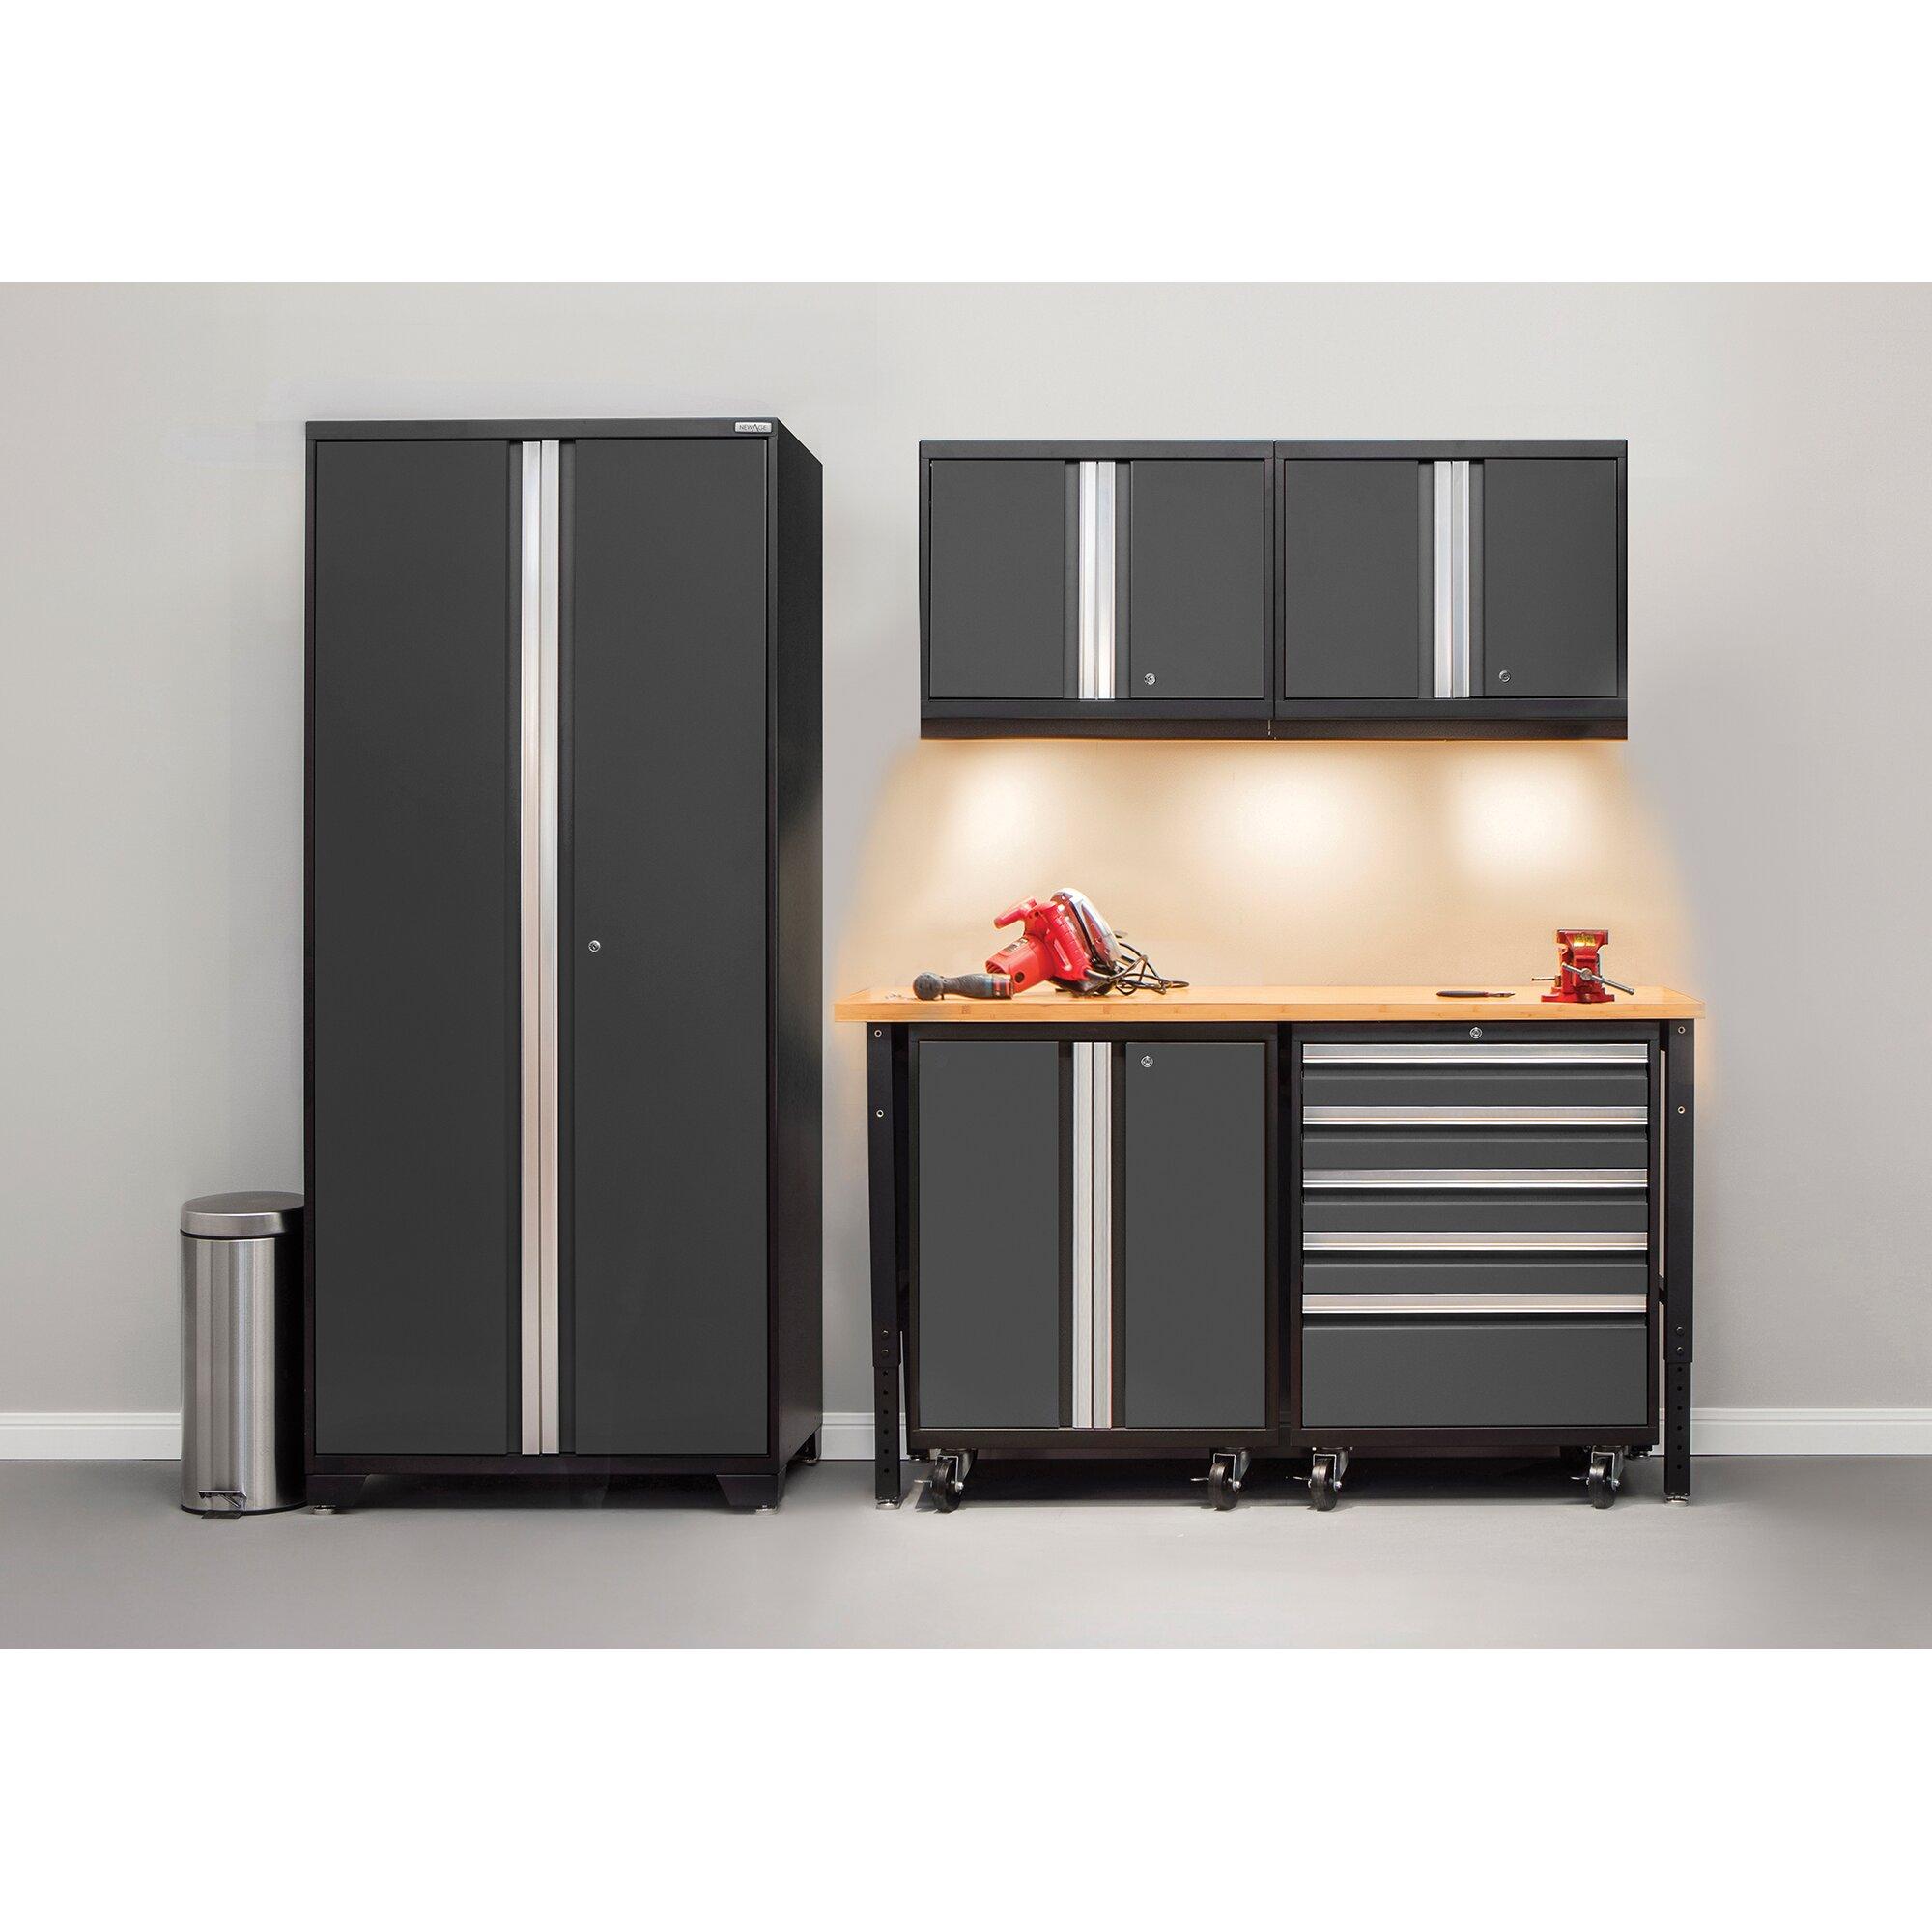 Buy Kitchen Cabinet Set